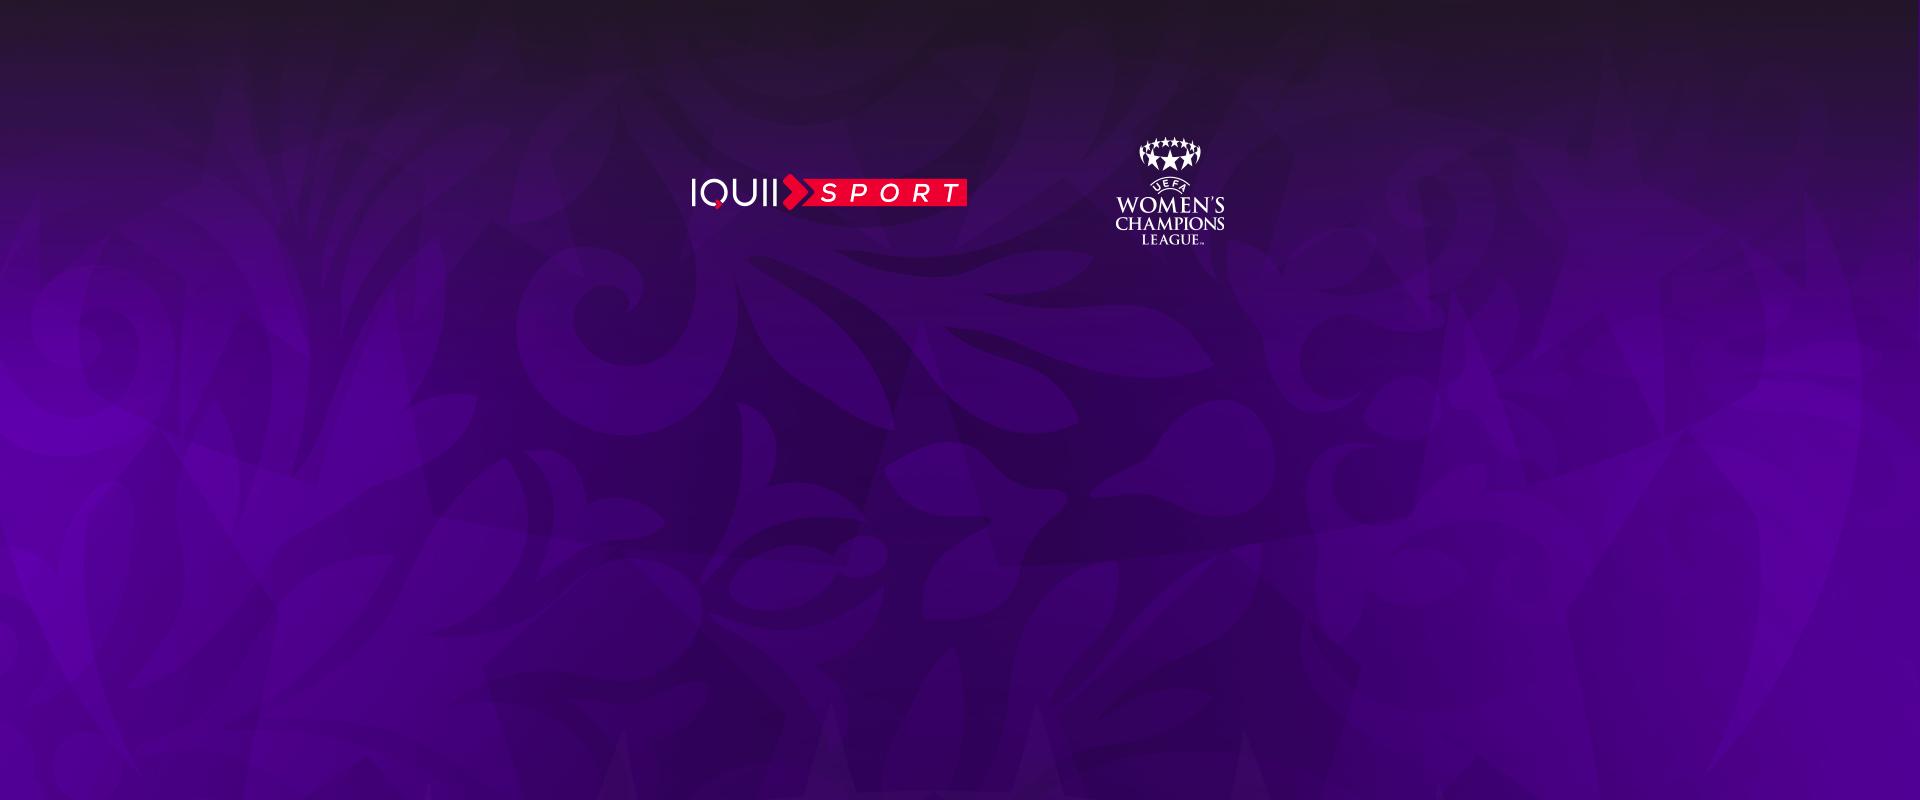 UEFA Women's Champions League 2020